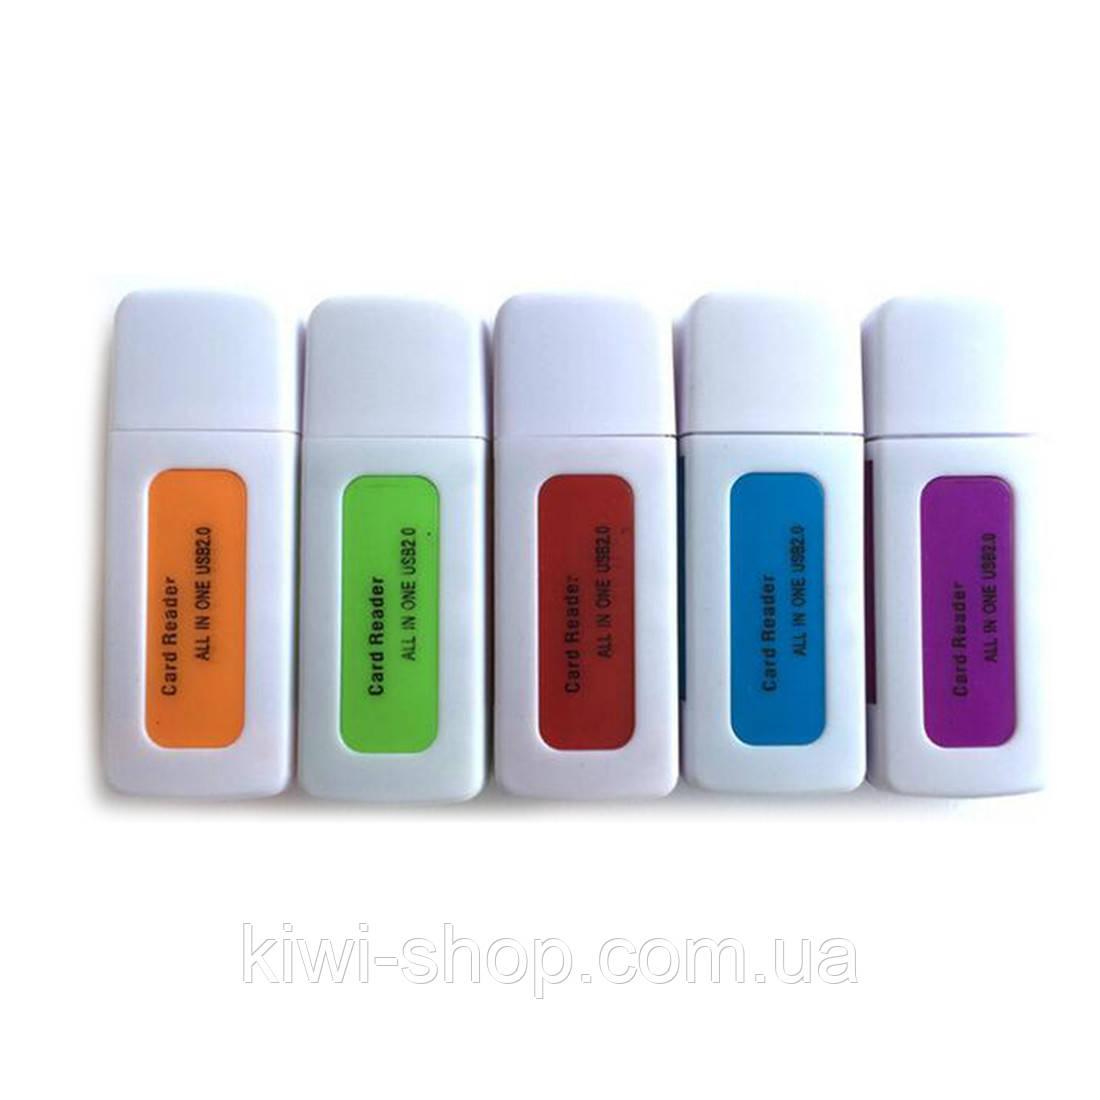 Картридер универсальный SD, Mini SD, Micro SD, M2